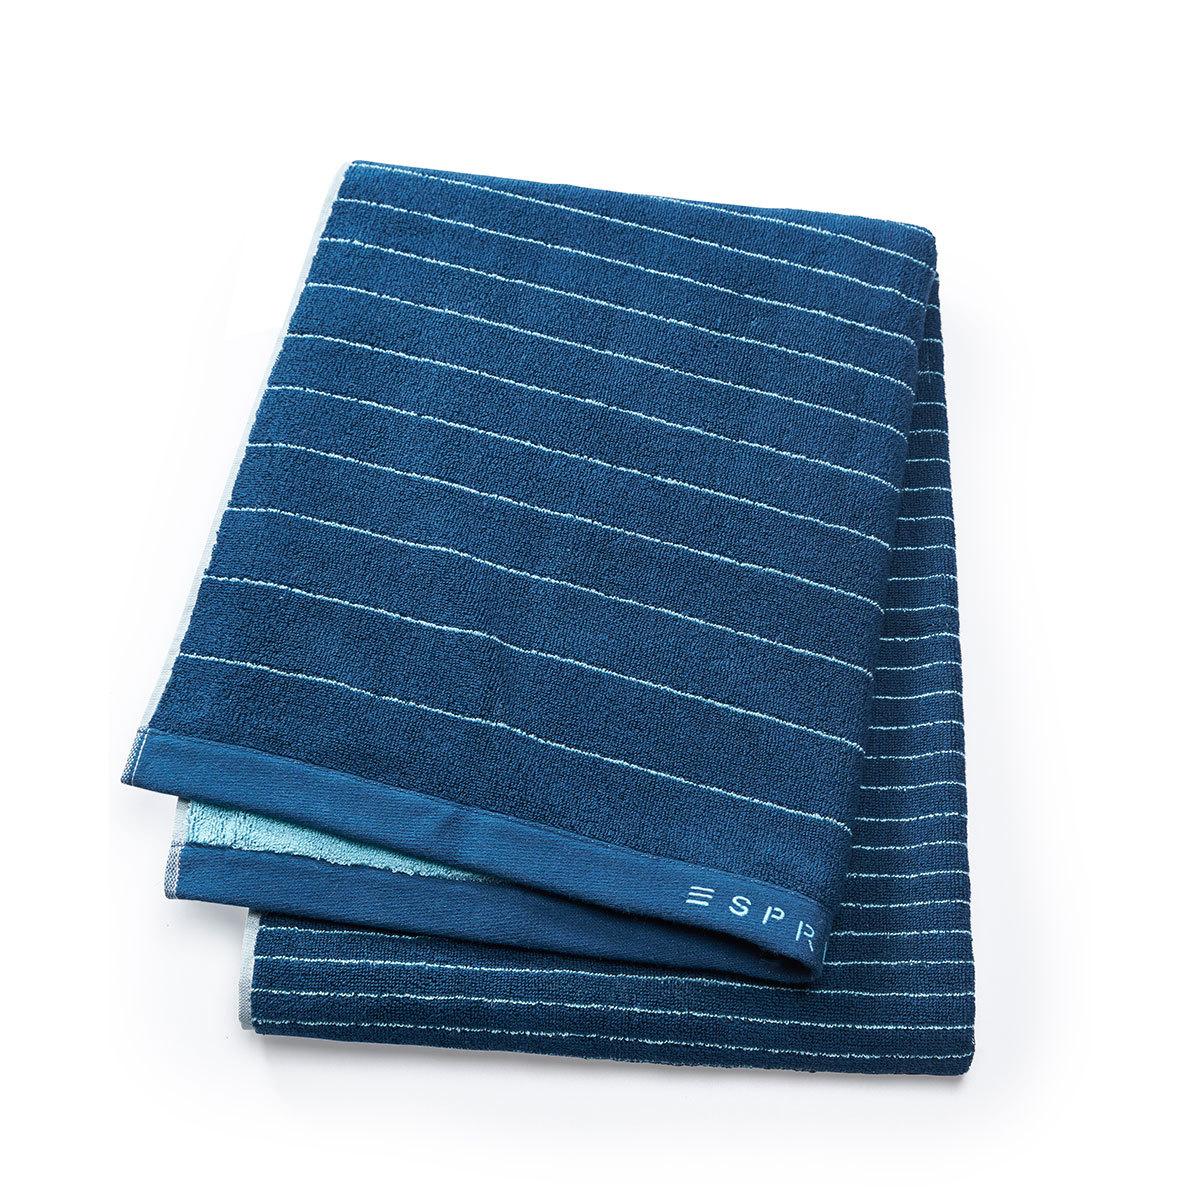 esprit handt cher grade jeans g nstig online kaufen bei bettwaren shop. Black Bedroom Furniture Sets. Home Design Ideas